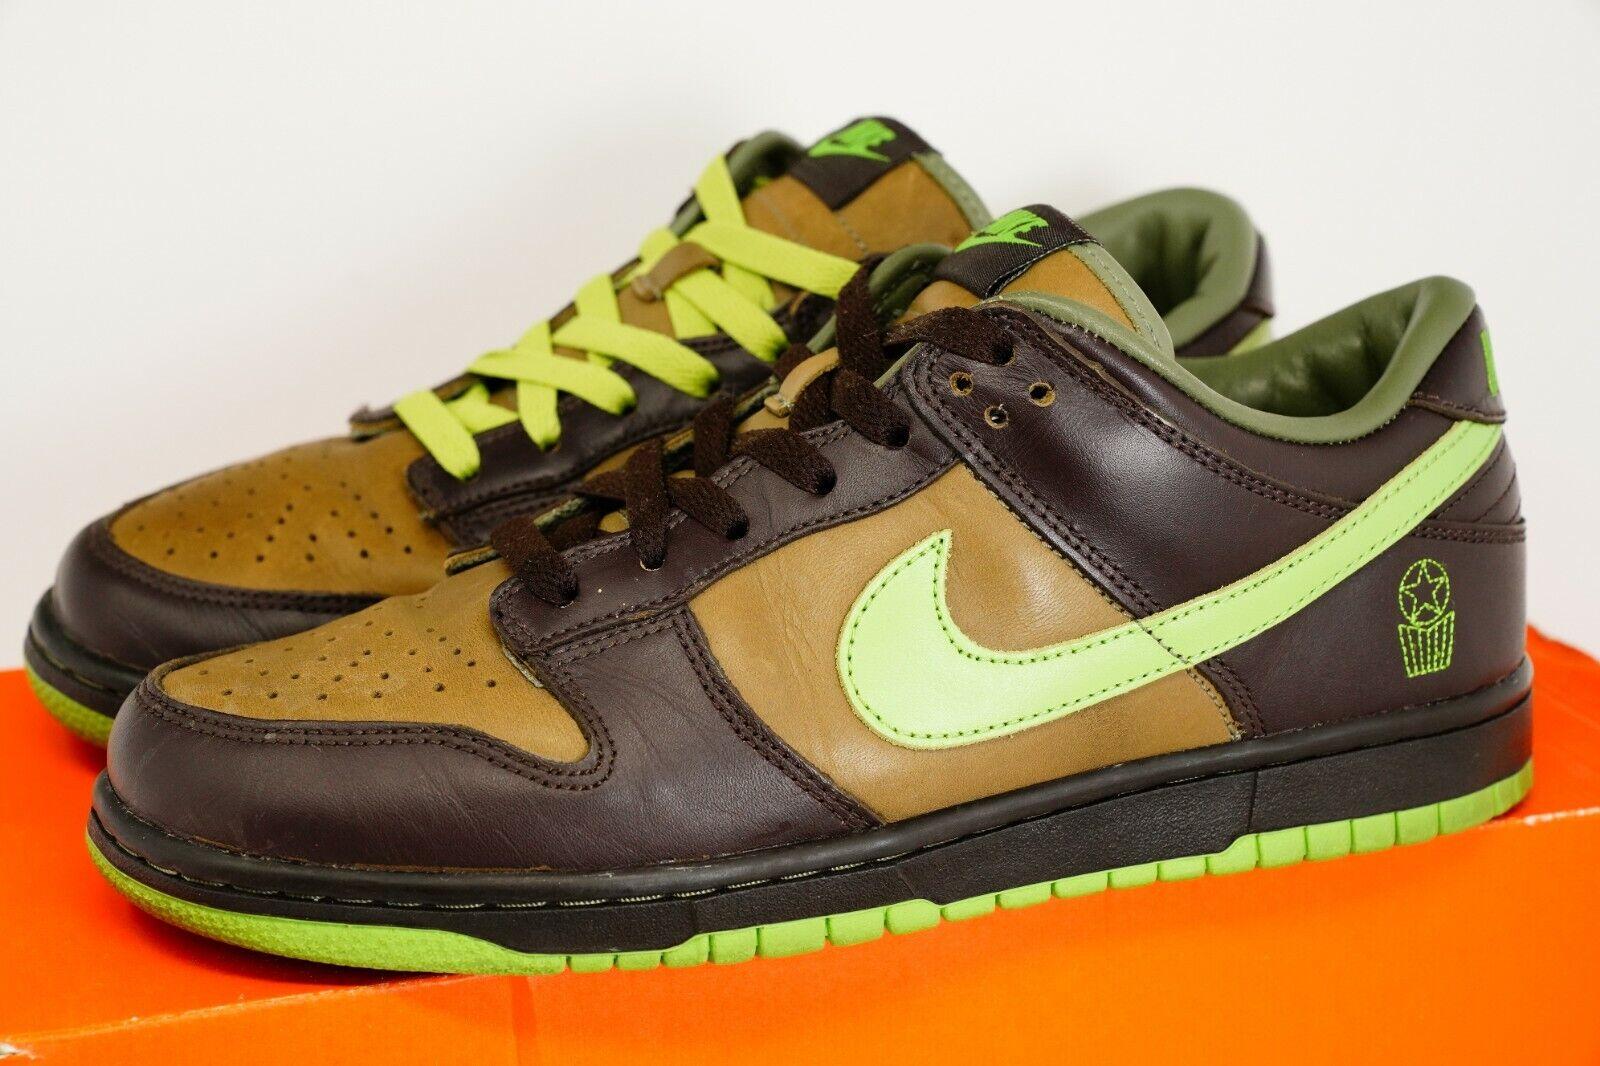 Nike Dunk Low ex ID Mundo Aros zapatos talla 10 (Cinder Judia verde Oliva 316894-232)